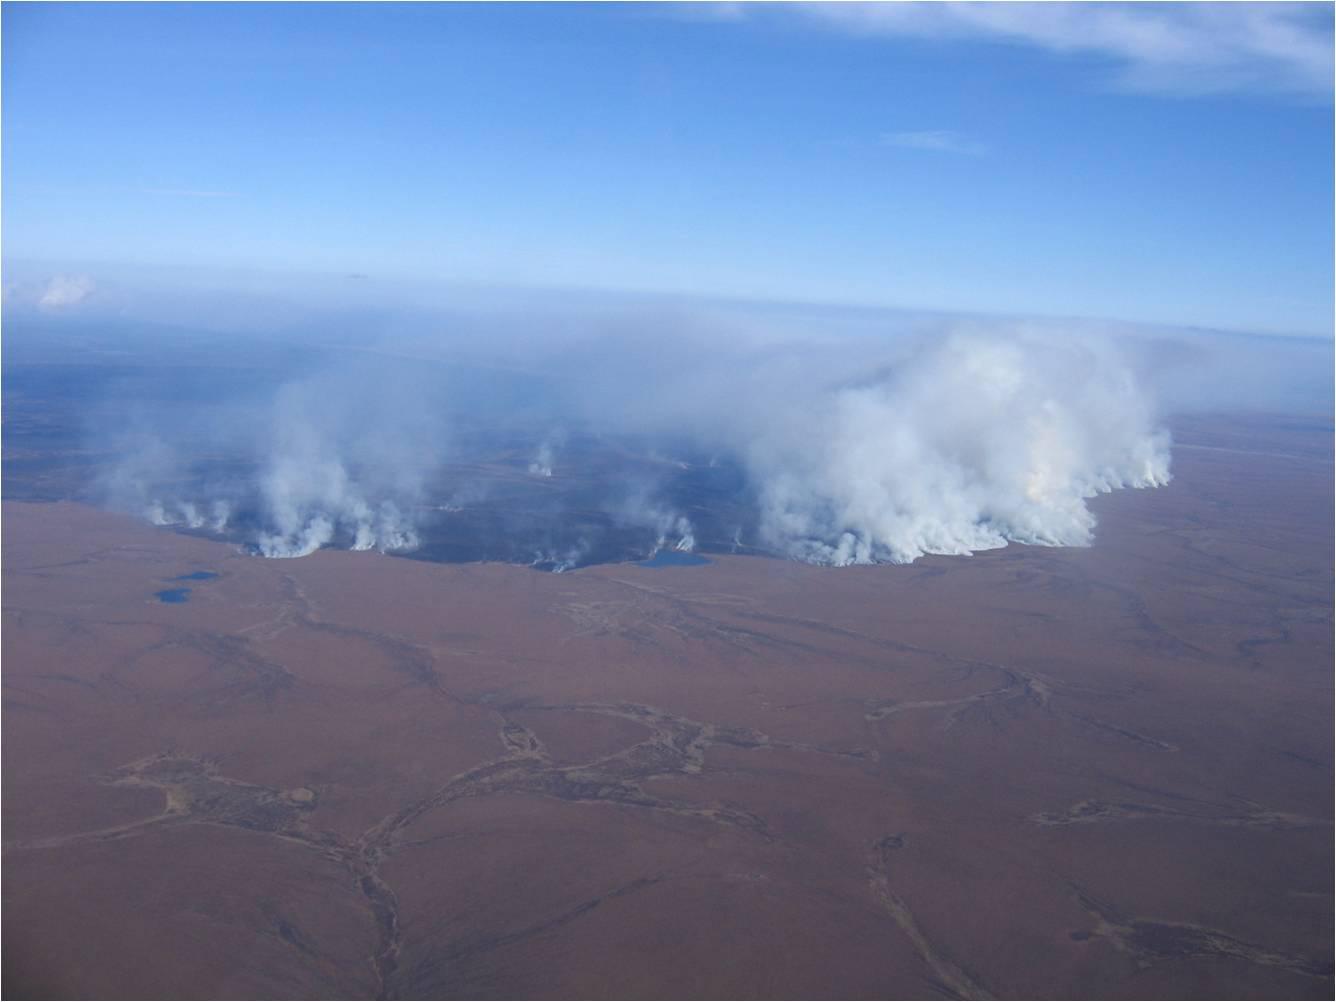 2007. Anaktuvuk River Fire, North Slope, Alaska. (Alaska Fire Service).